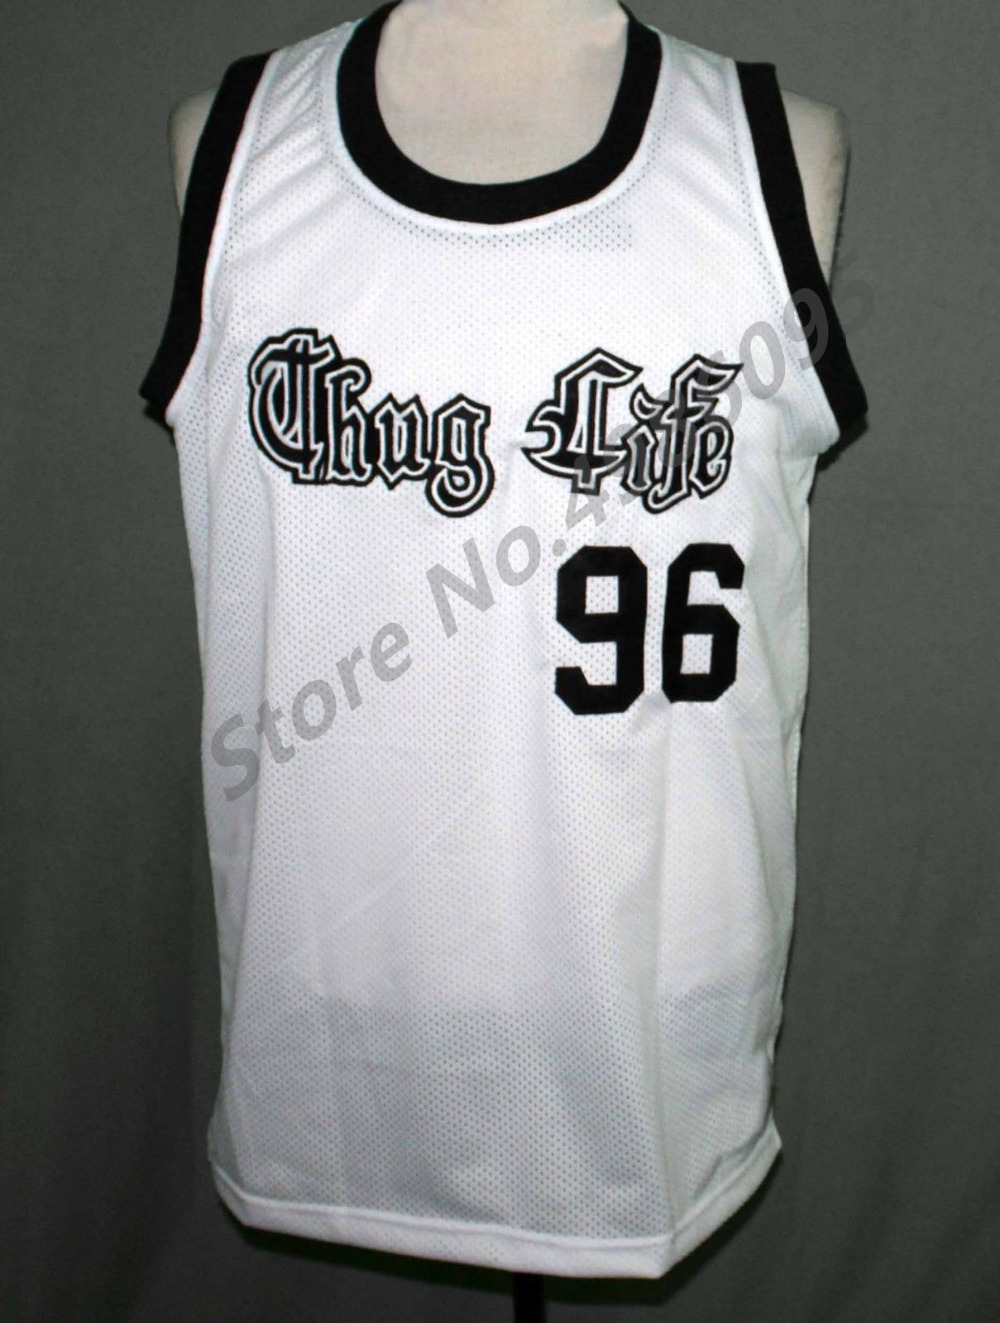 #96 Tupac Shakur Thug Life 2Pac Retro Basketball Jersey Mens Stitched Custom Any Number Name Jerseys